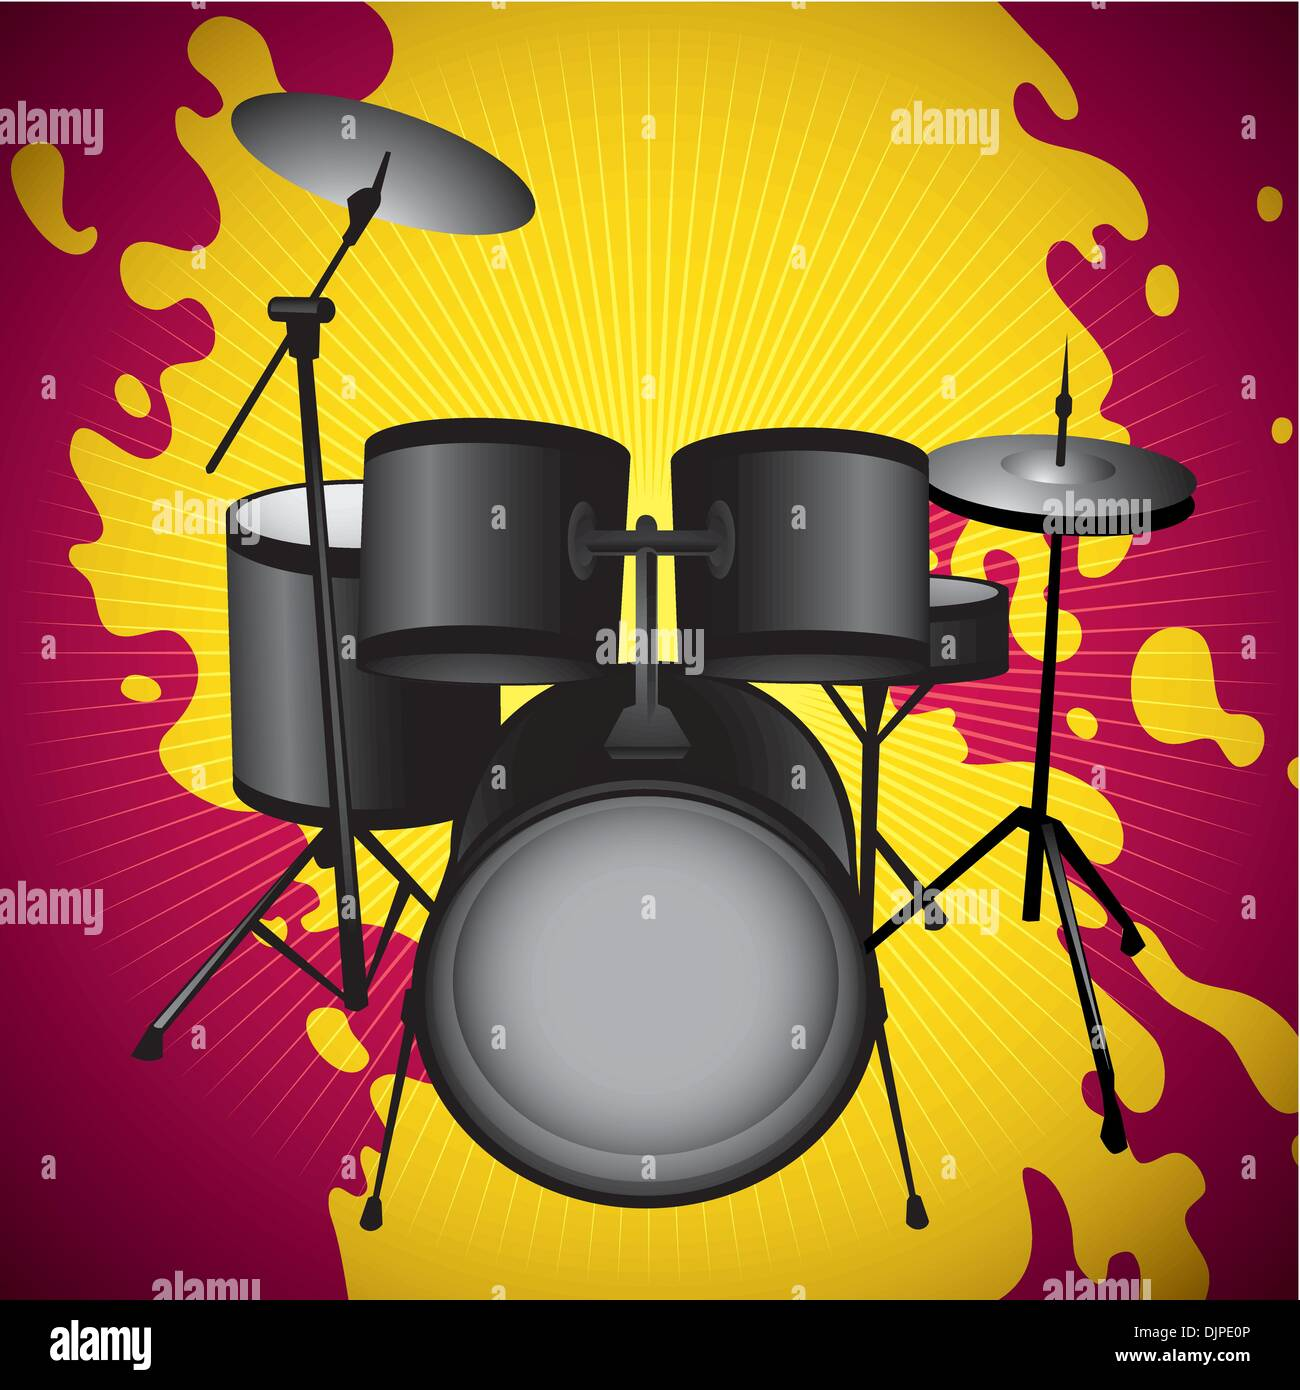 Drum Set Stock Vector Images - Alamy